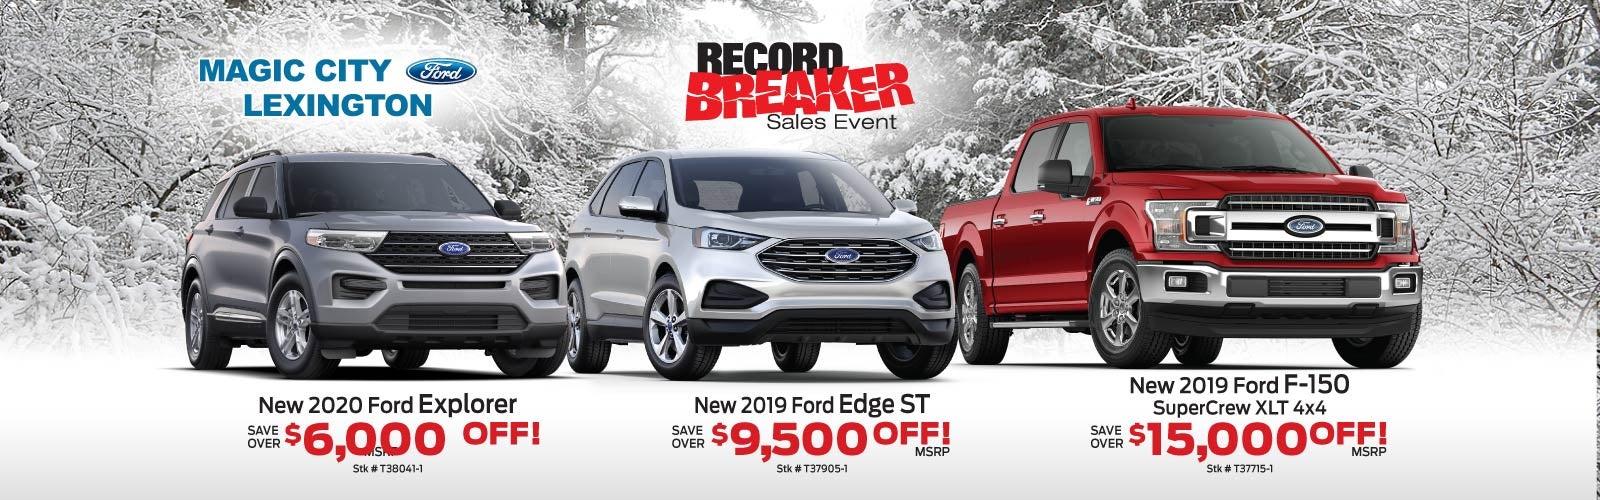 Virginia Auto Sales Tax >> Ford Dealer In Lexington Va Used Cars Lexington Magic